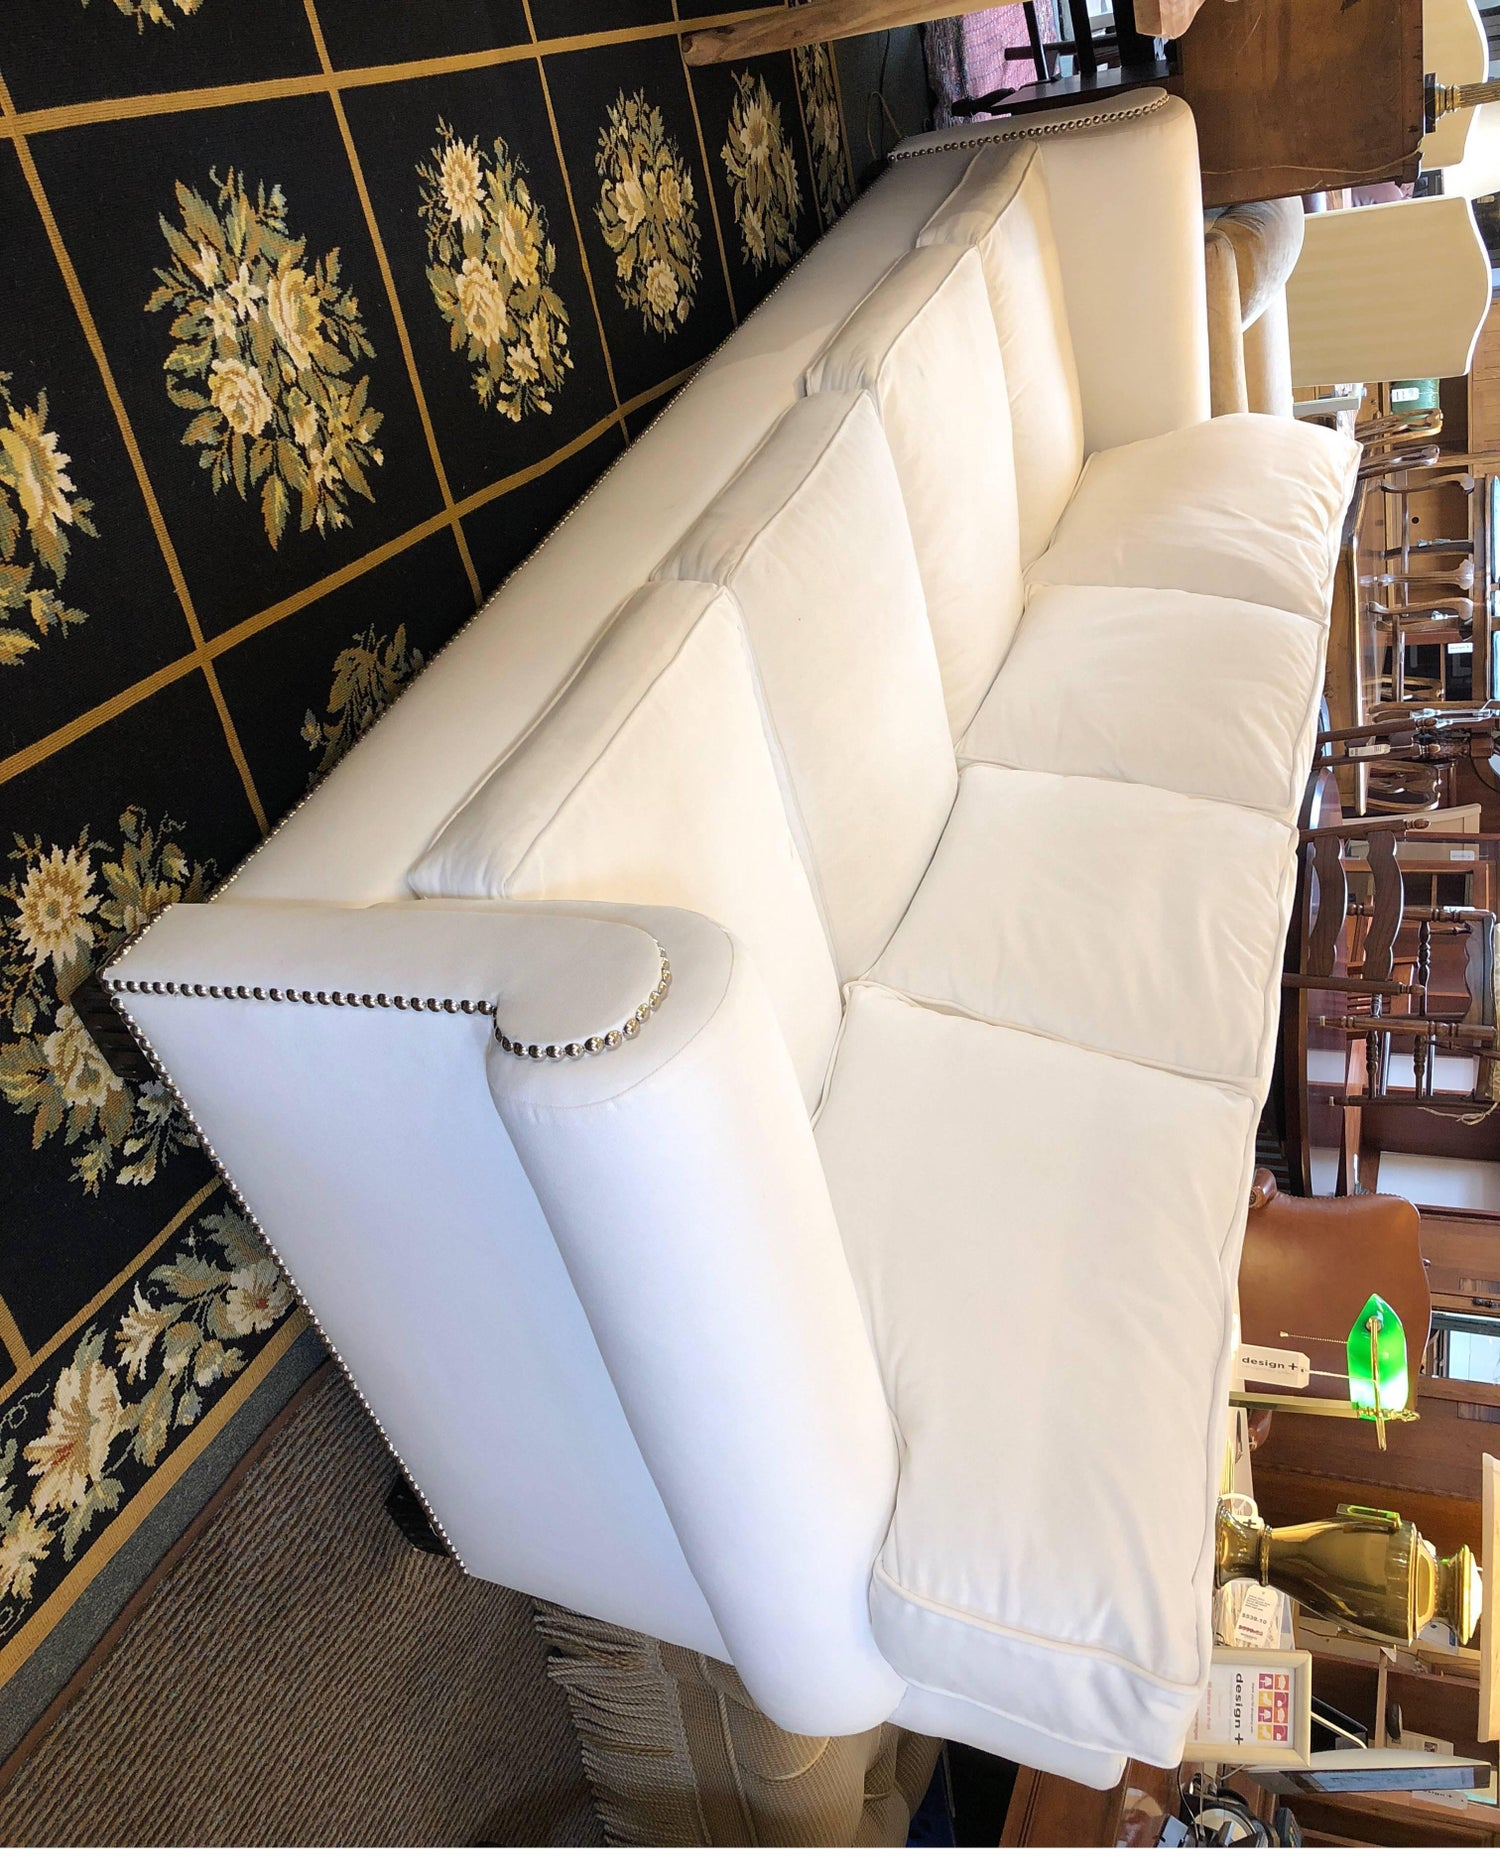 Astounding Ralph Lauren Jamaica Salon Sofa For Sale At 1Stdibs Andrewgaddart Wooden Chair Designs For Living Room Andrewgaddartcom